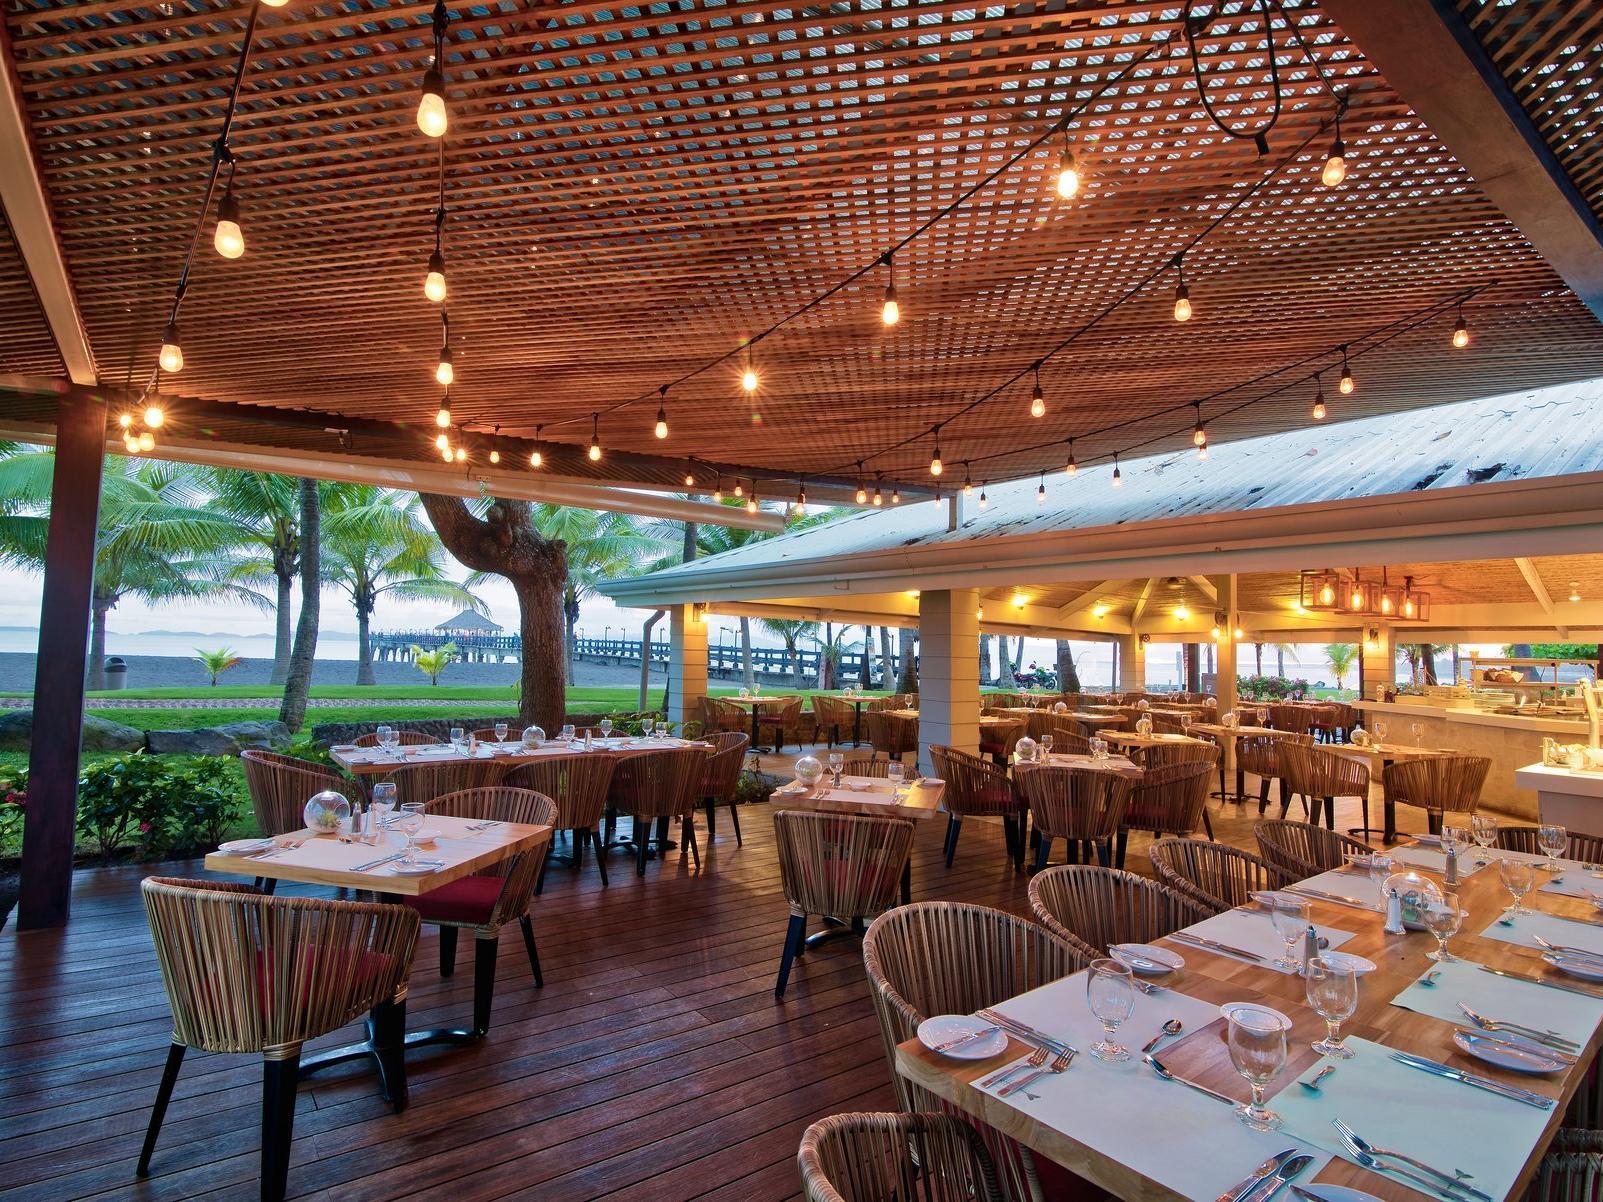 Beautiful wood furniture with dining at Fiesta resort